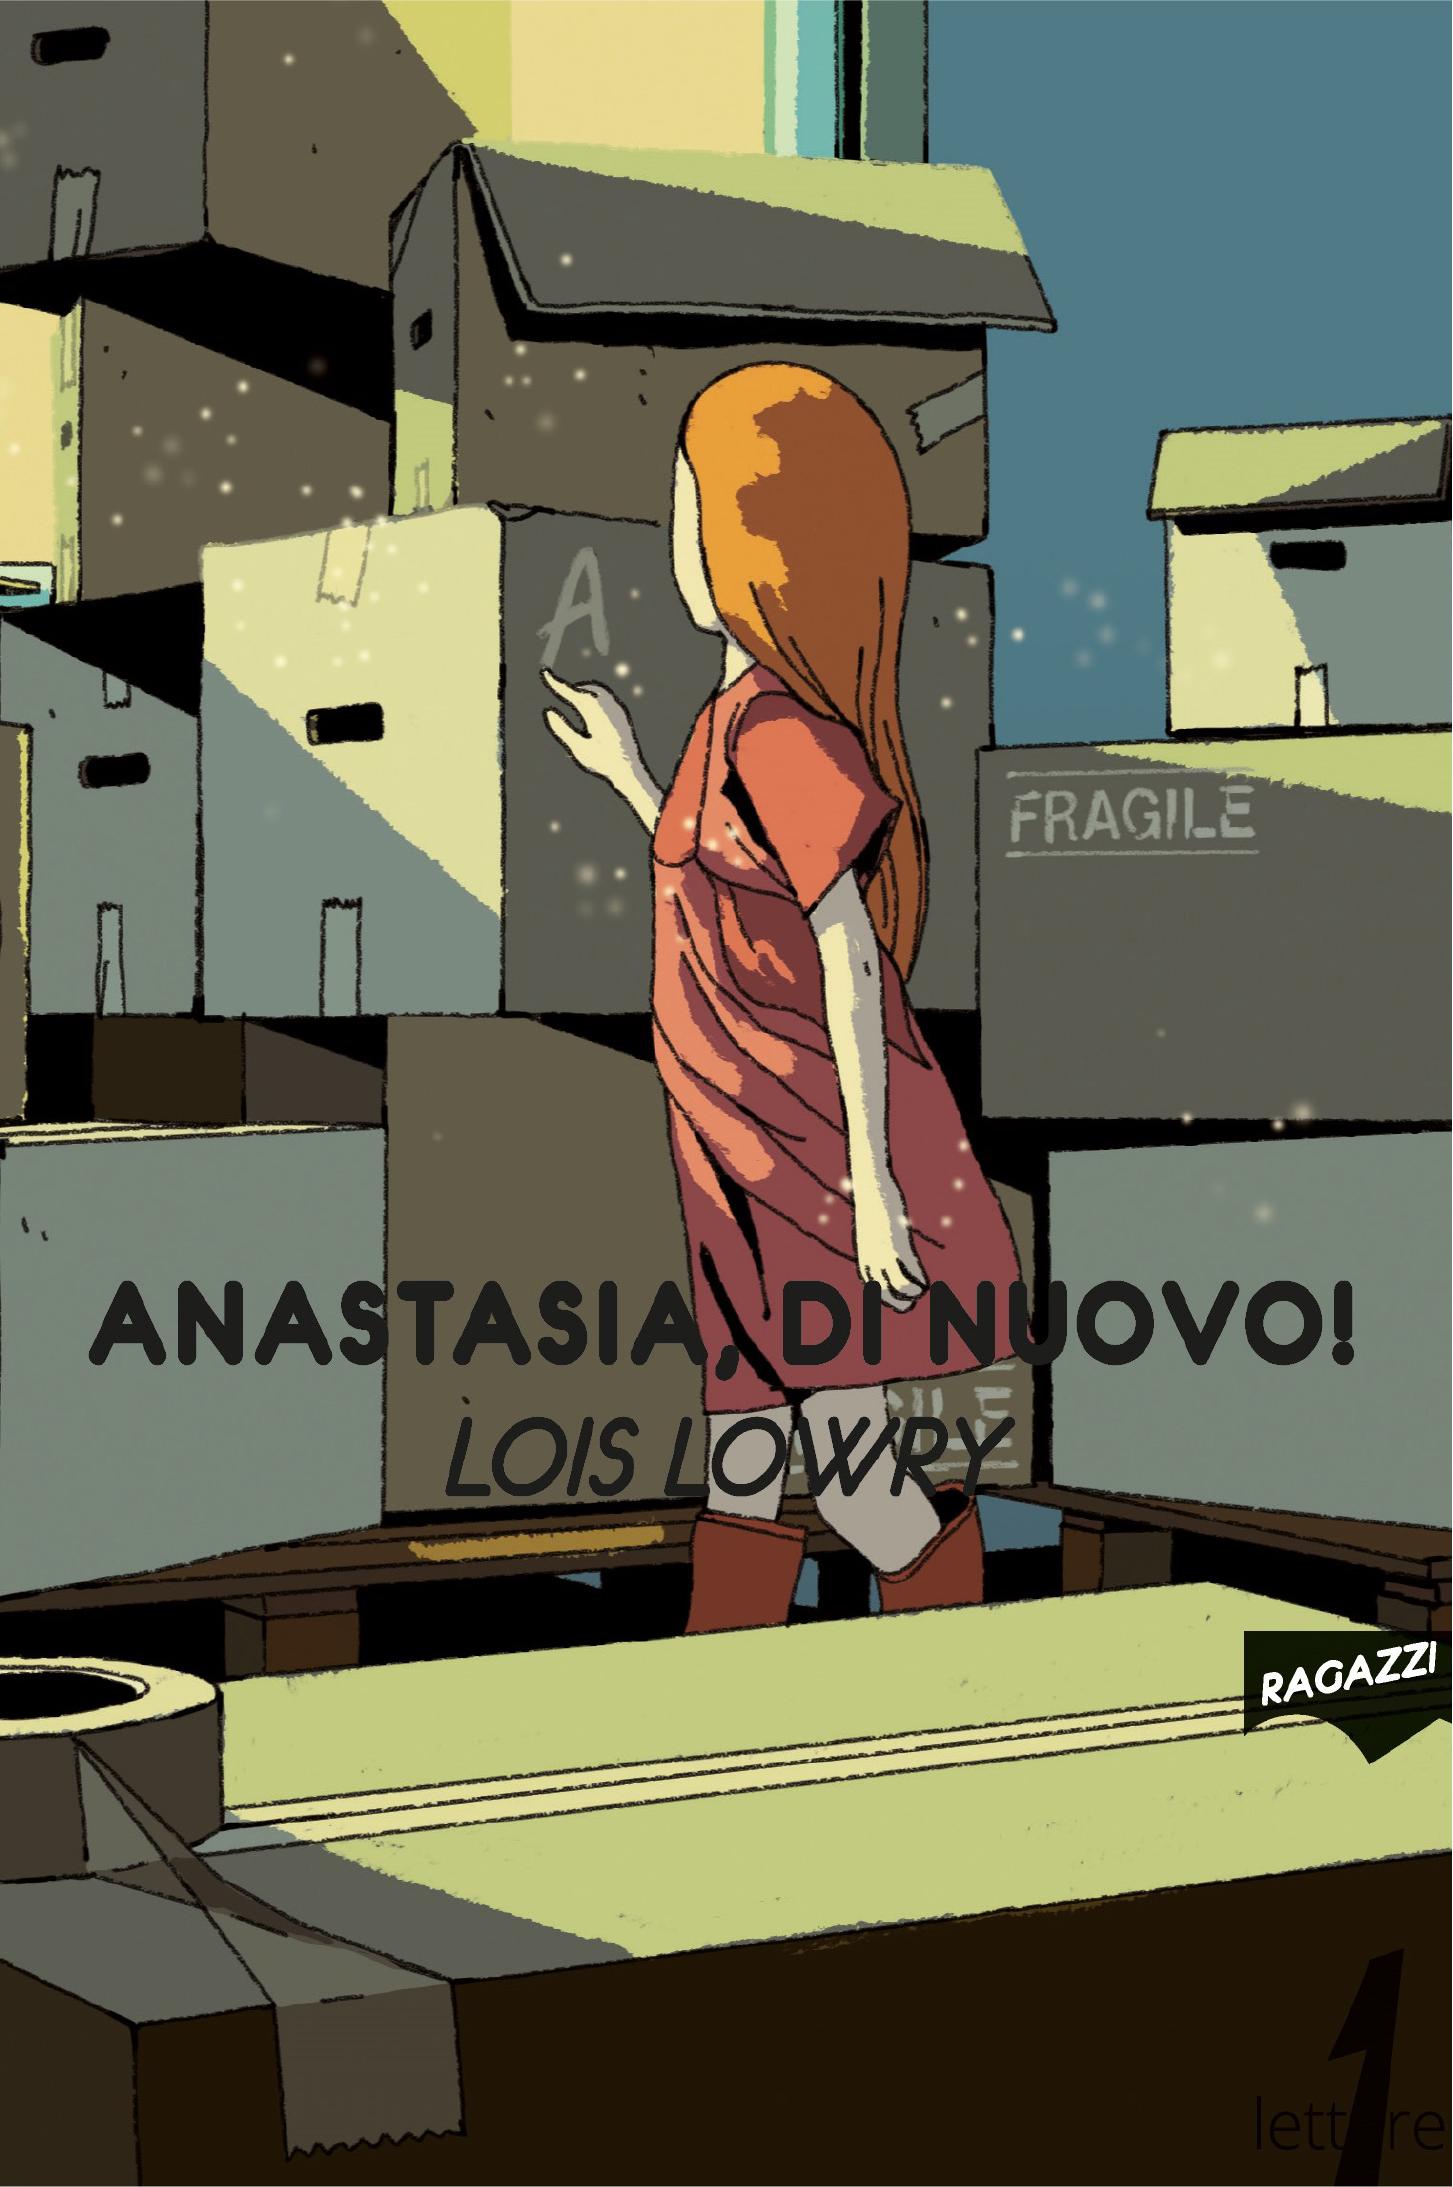 Anastasia di nuovo 1453x2186px